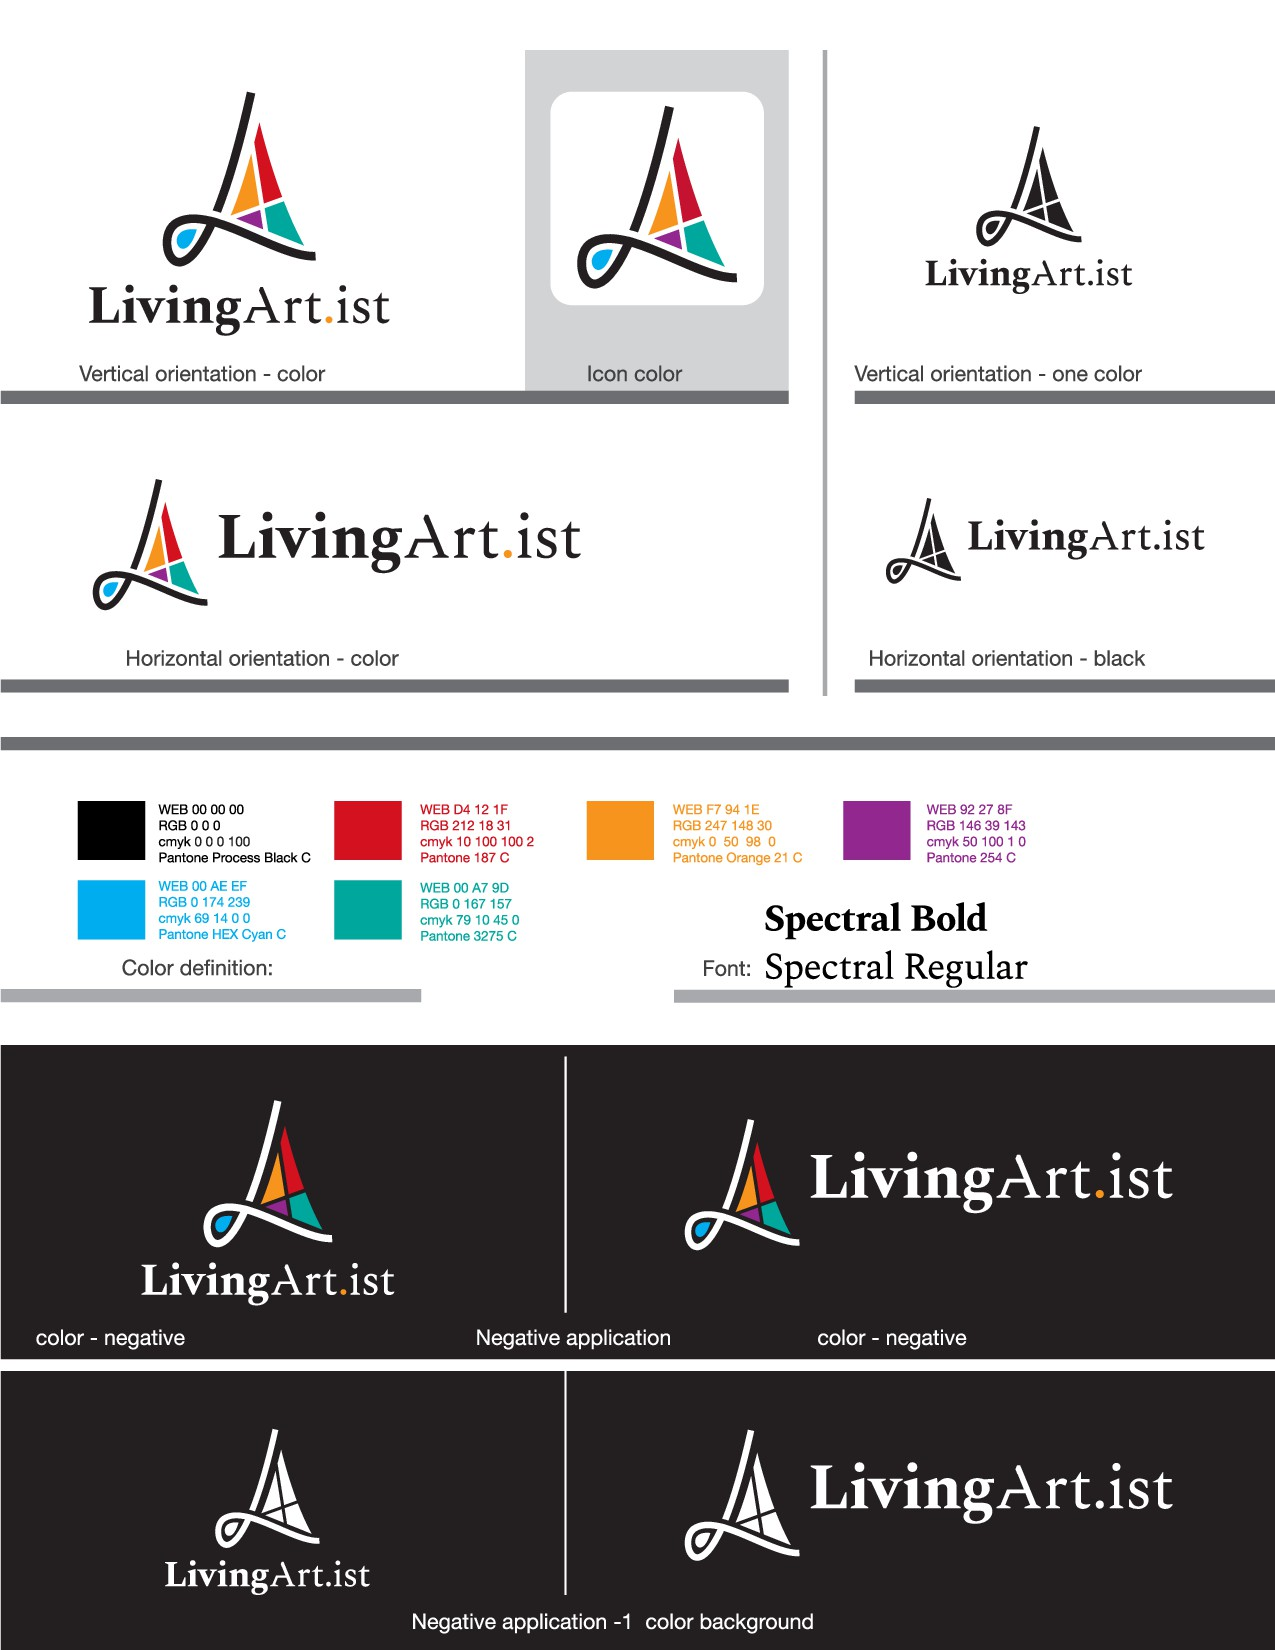 LivingArt.ist needs branding the world will love